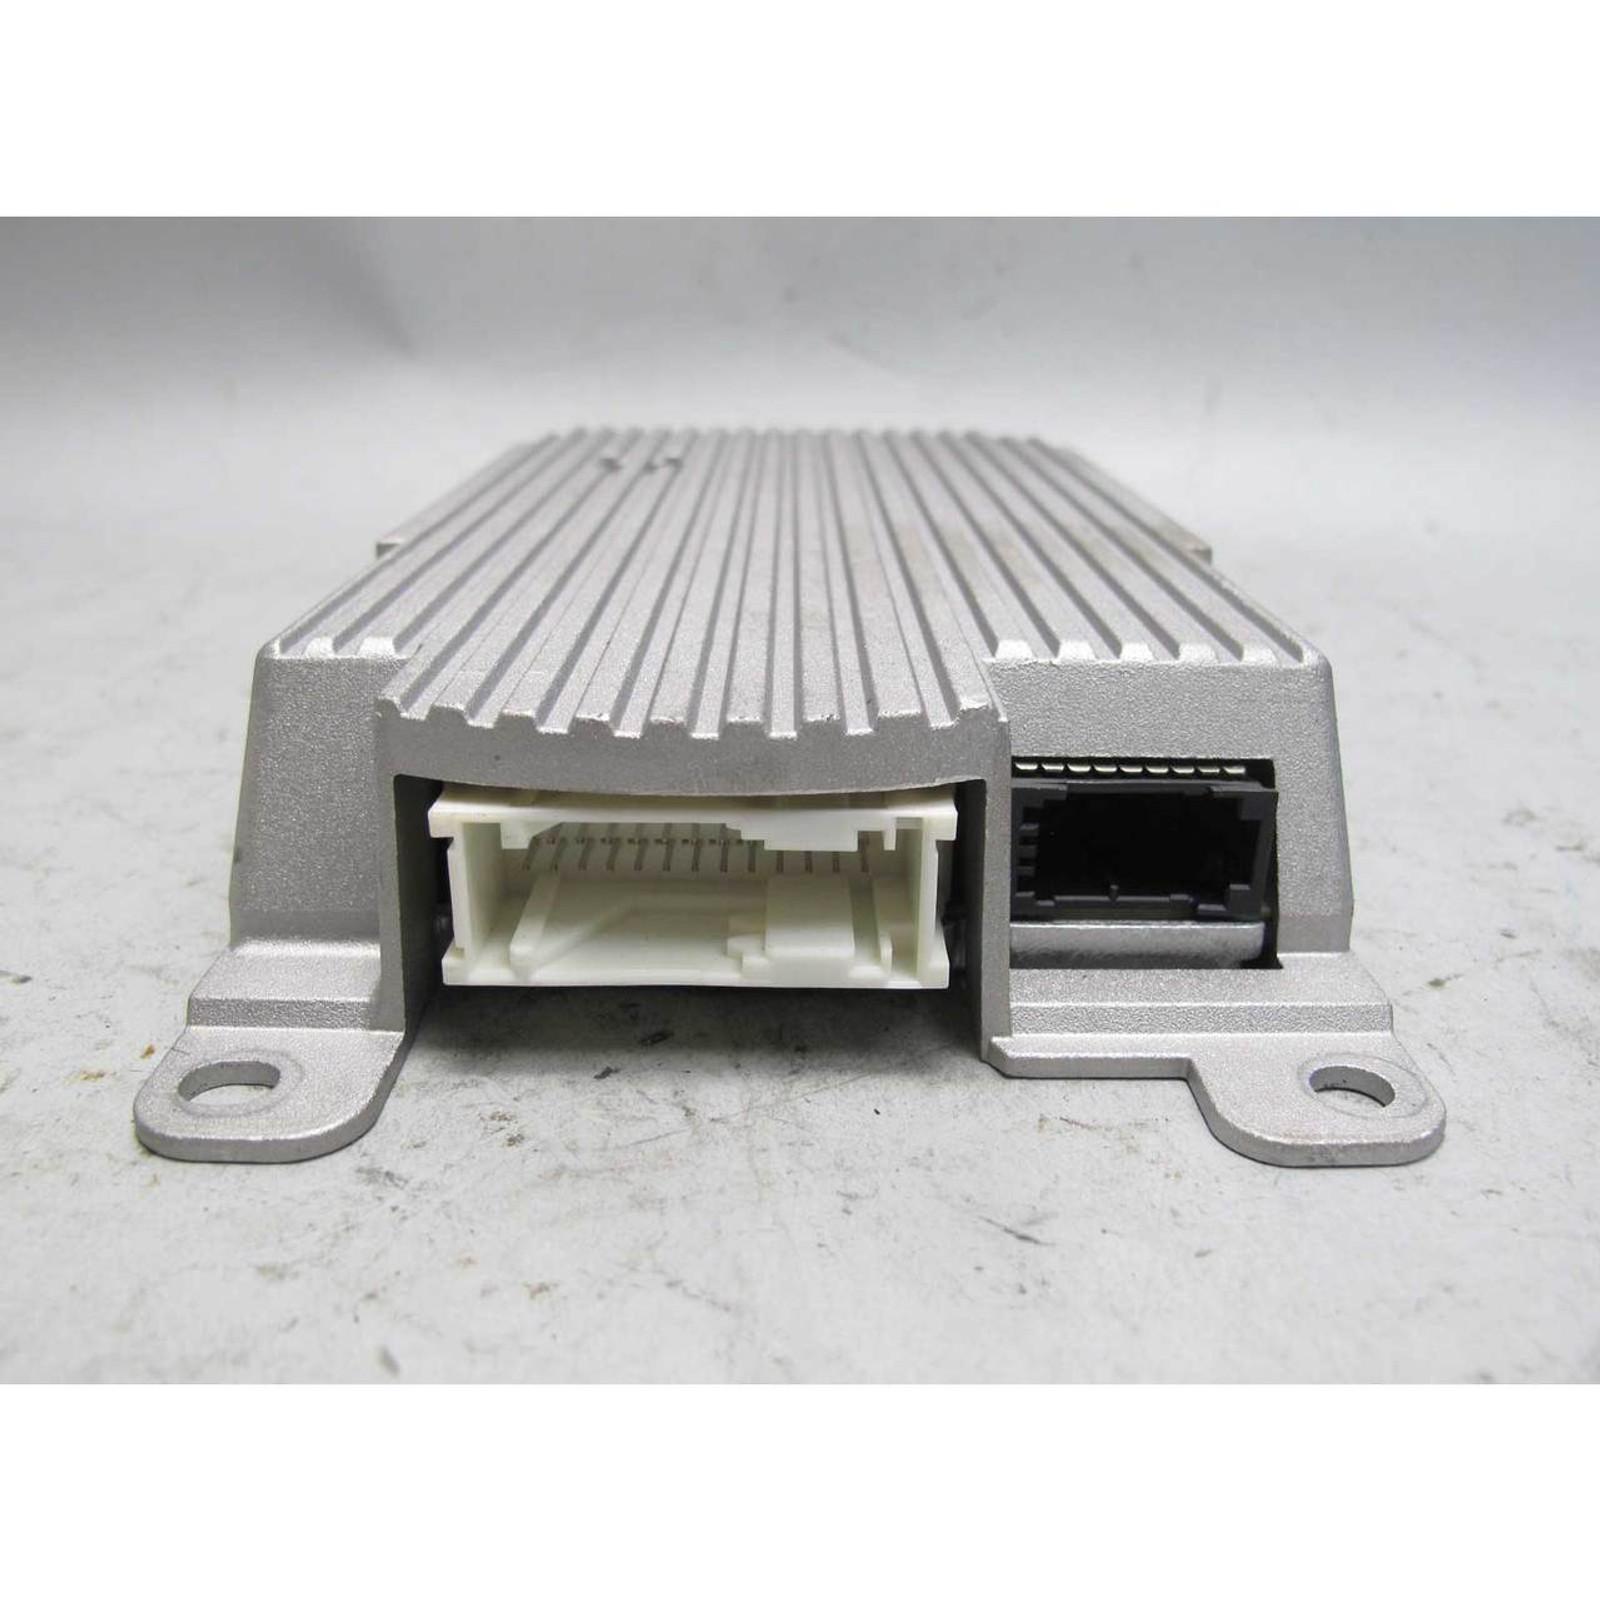 2010-2017 BMW 5-Series 3-Series Communication Combox for Telematics  Navigation - 20088